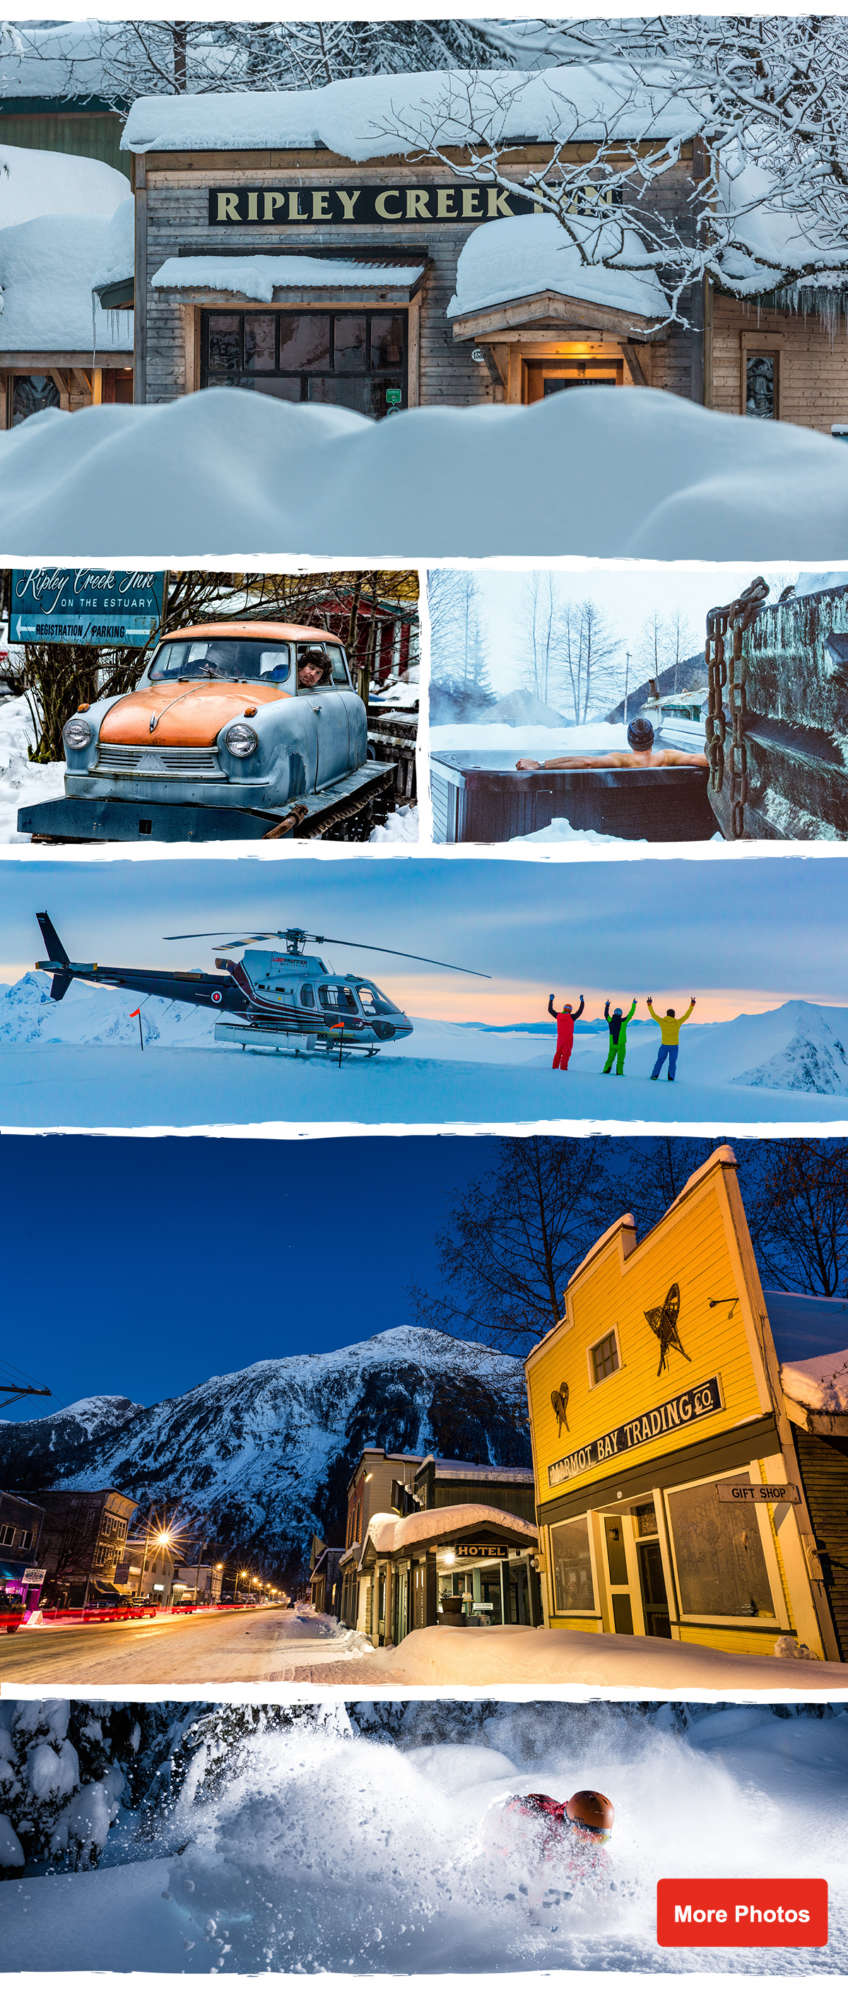 Ripley Creek Heli Skiing - Stewart BC Canada